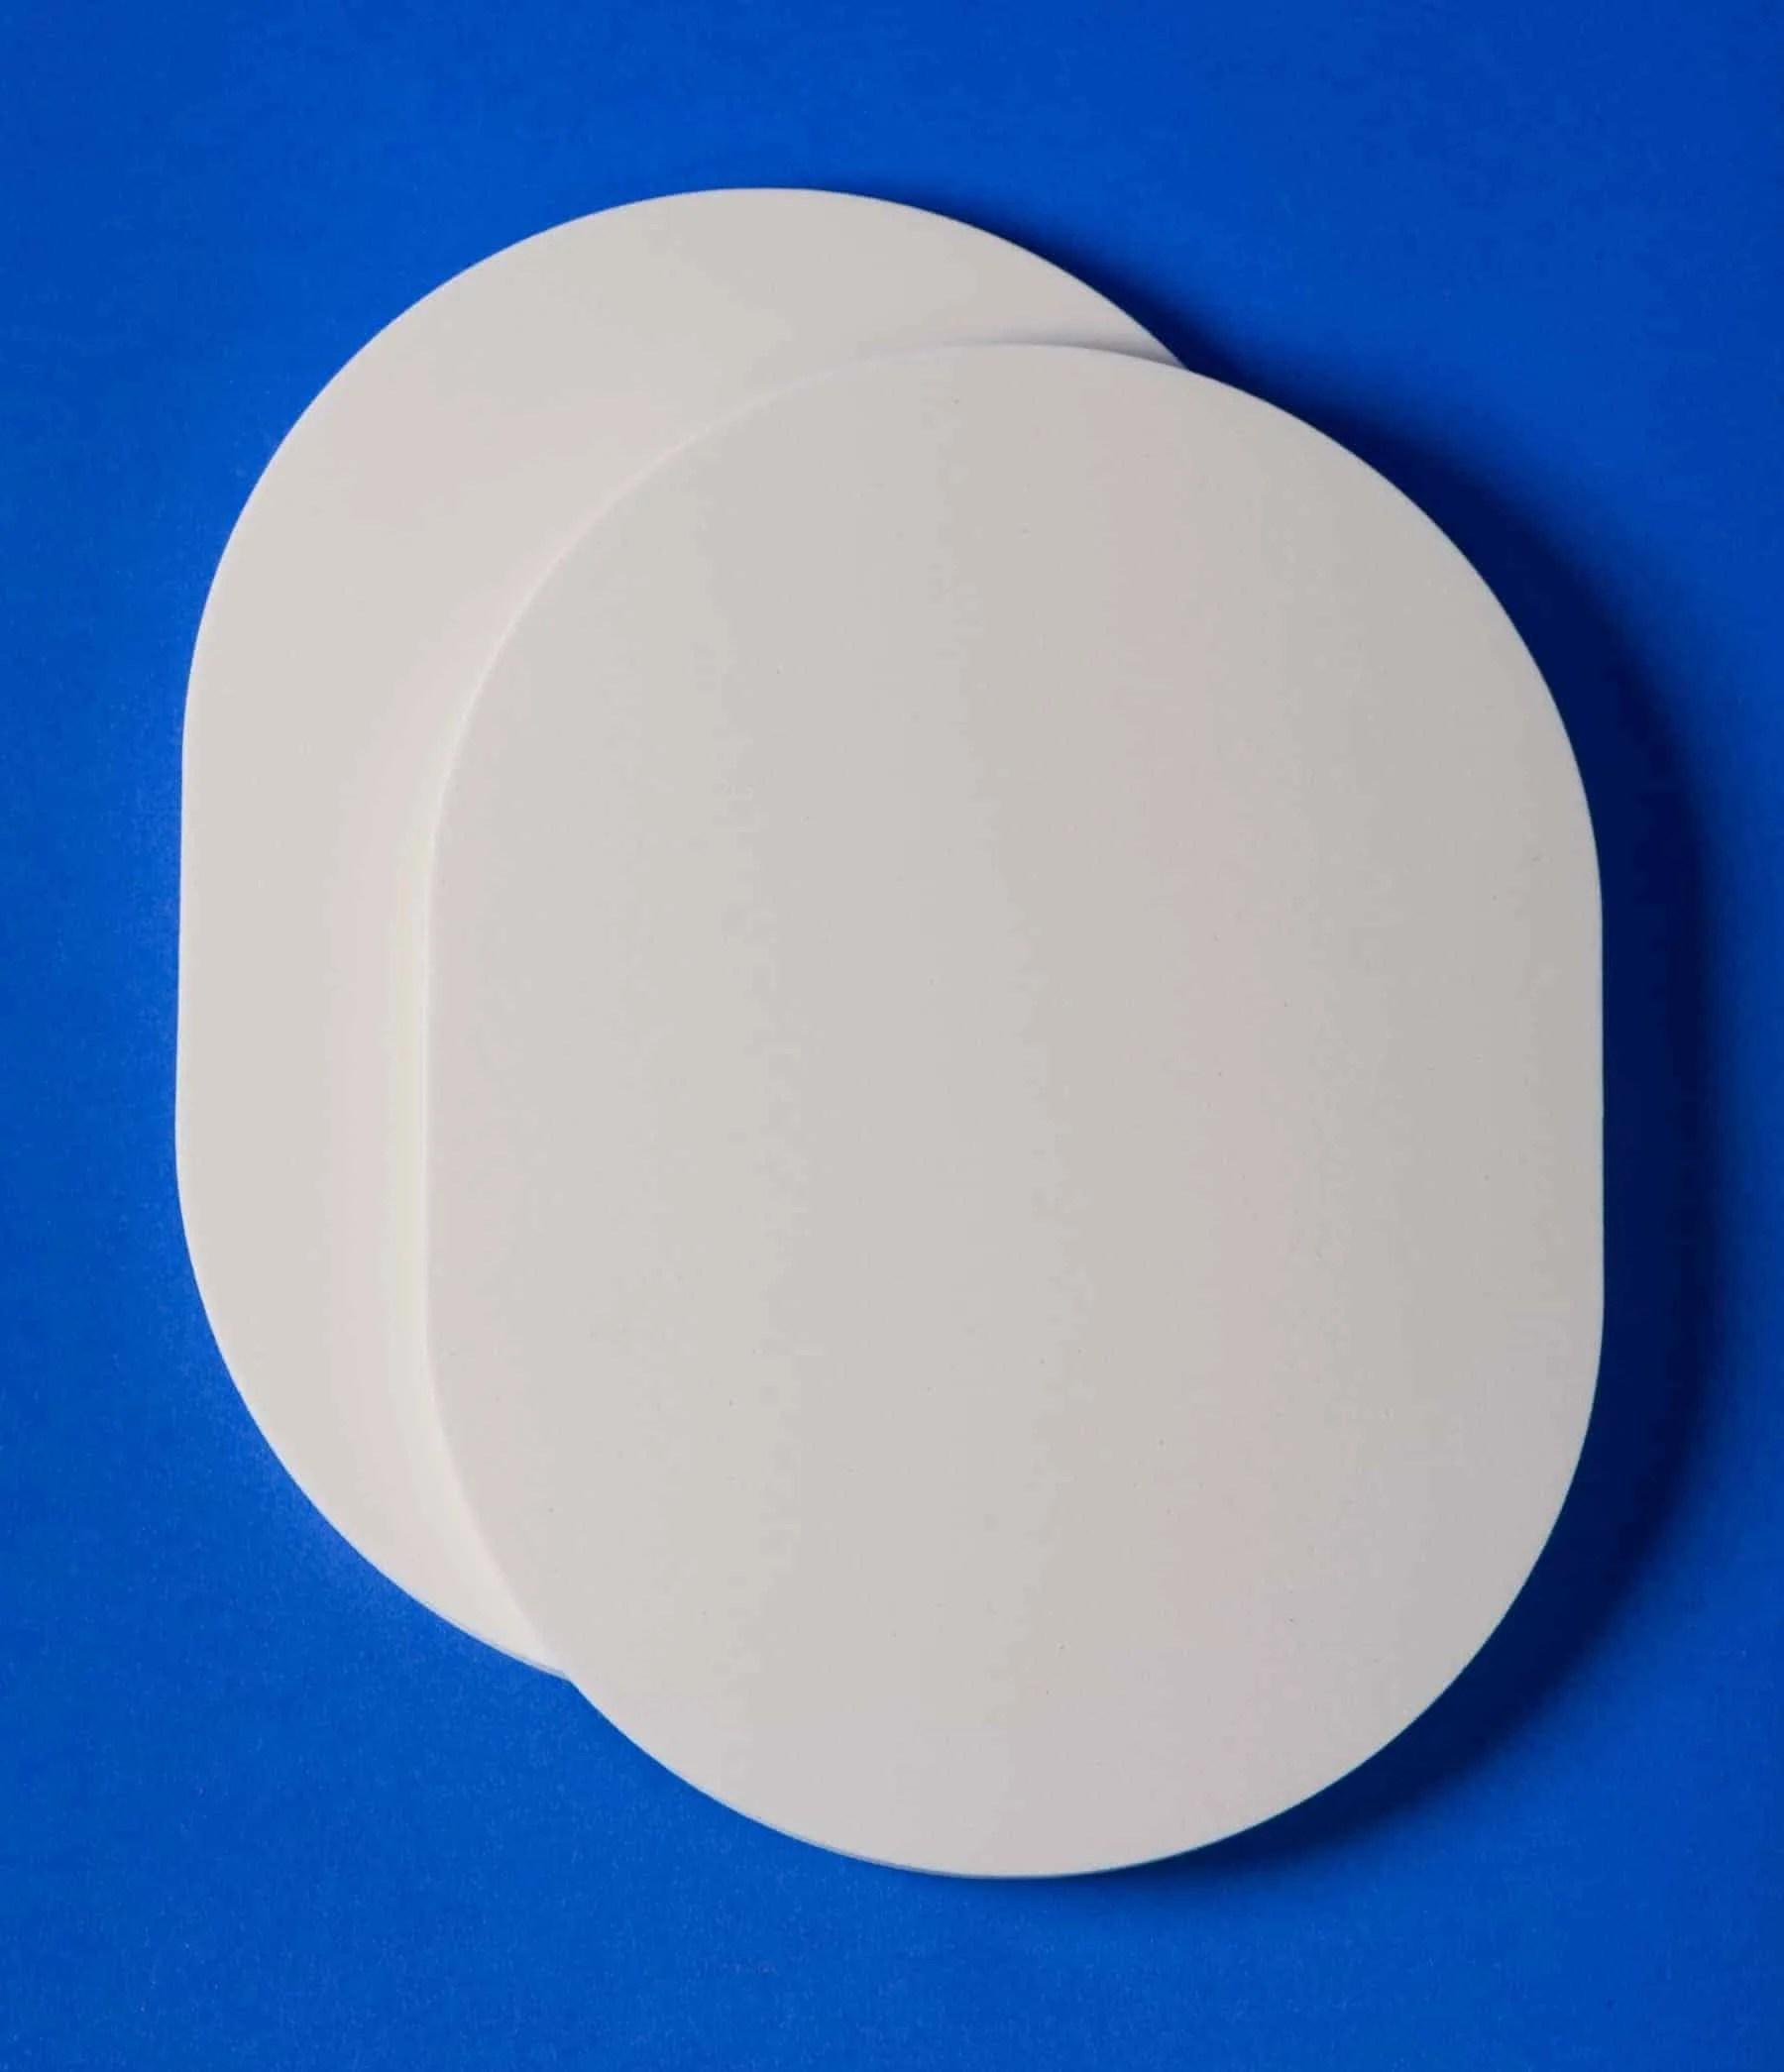 Geriatric Hip Protection Pads